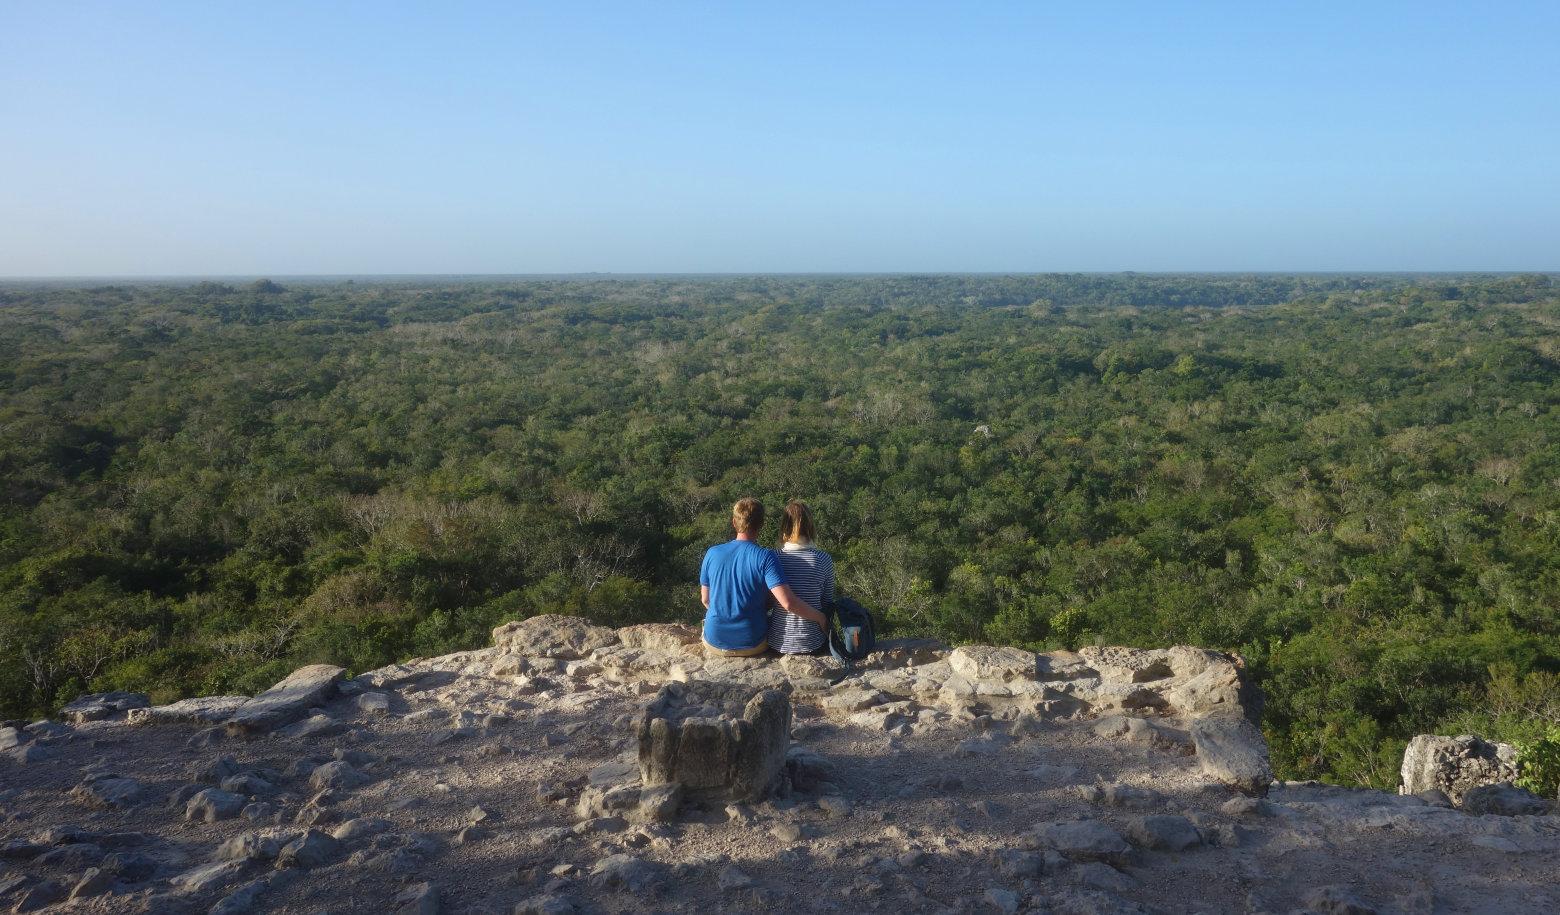 Mexiko Coba Pyramide Blick auf Dschungel